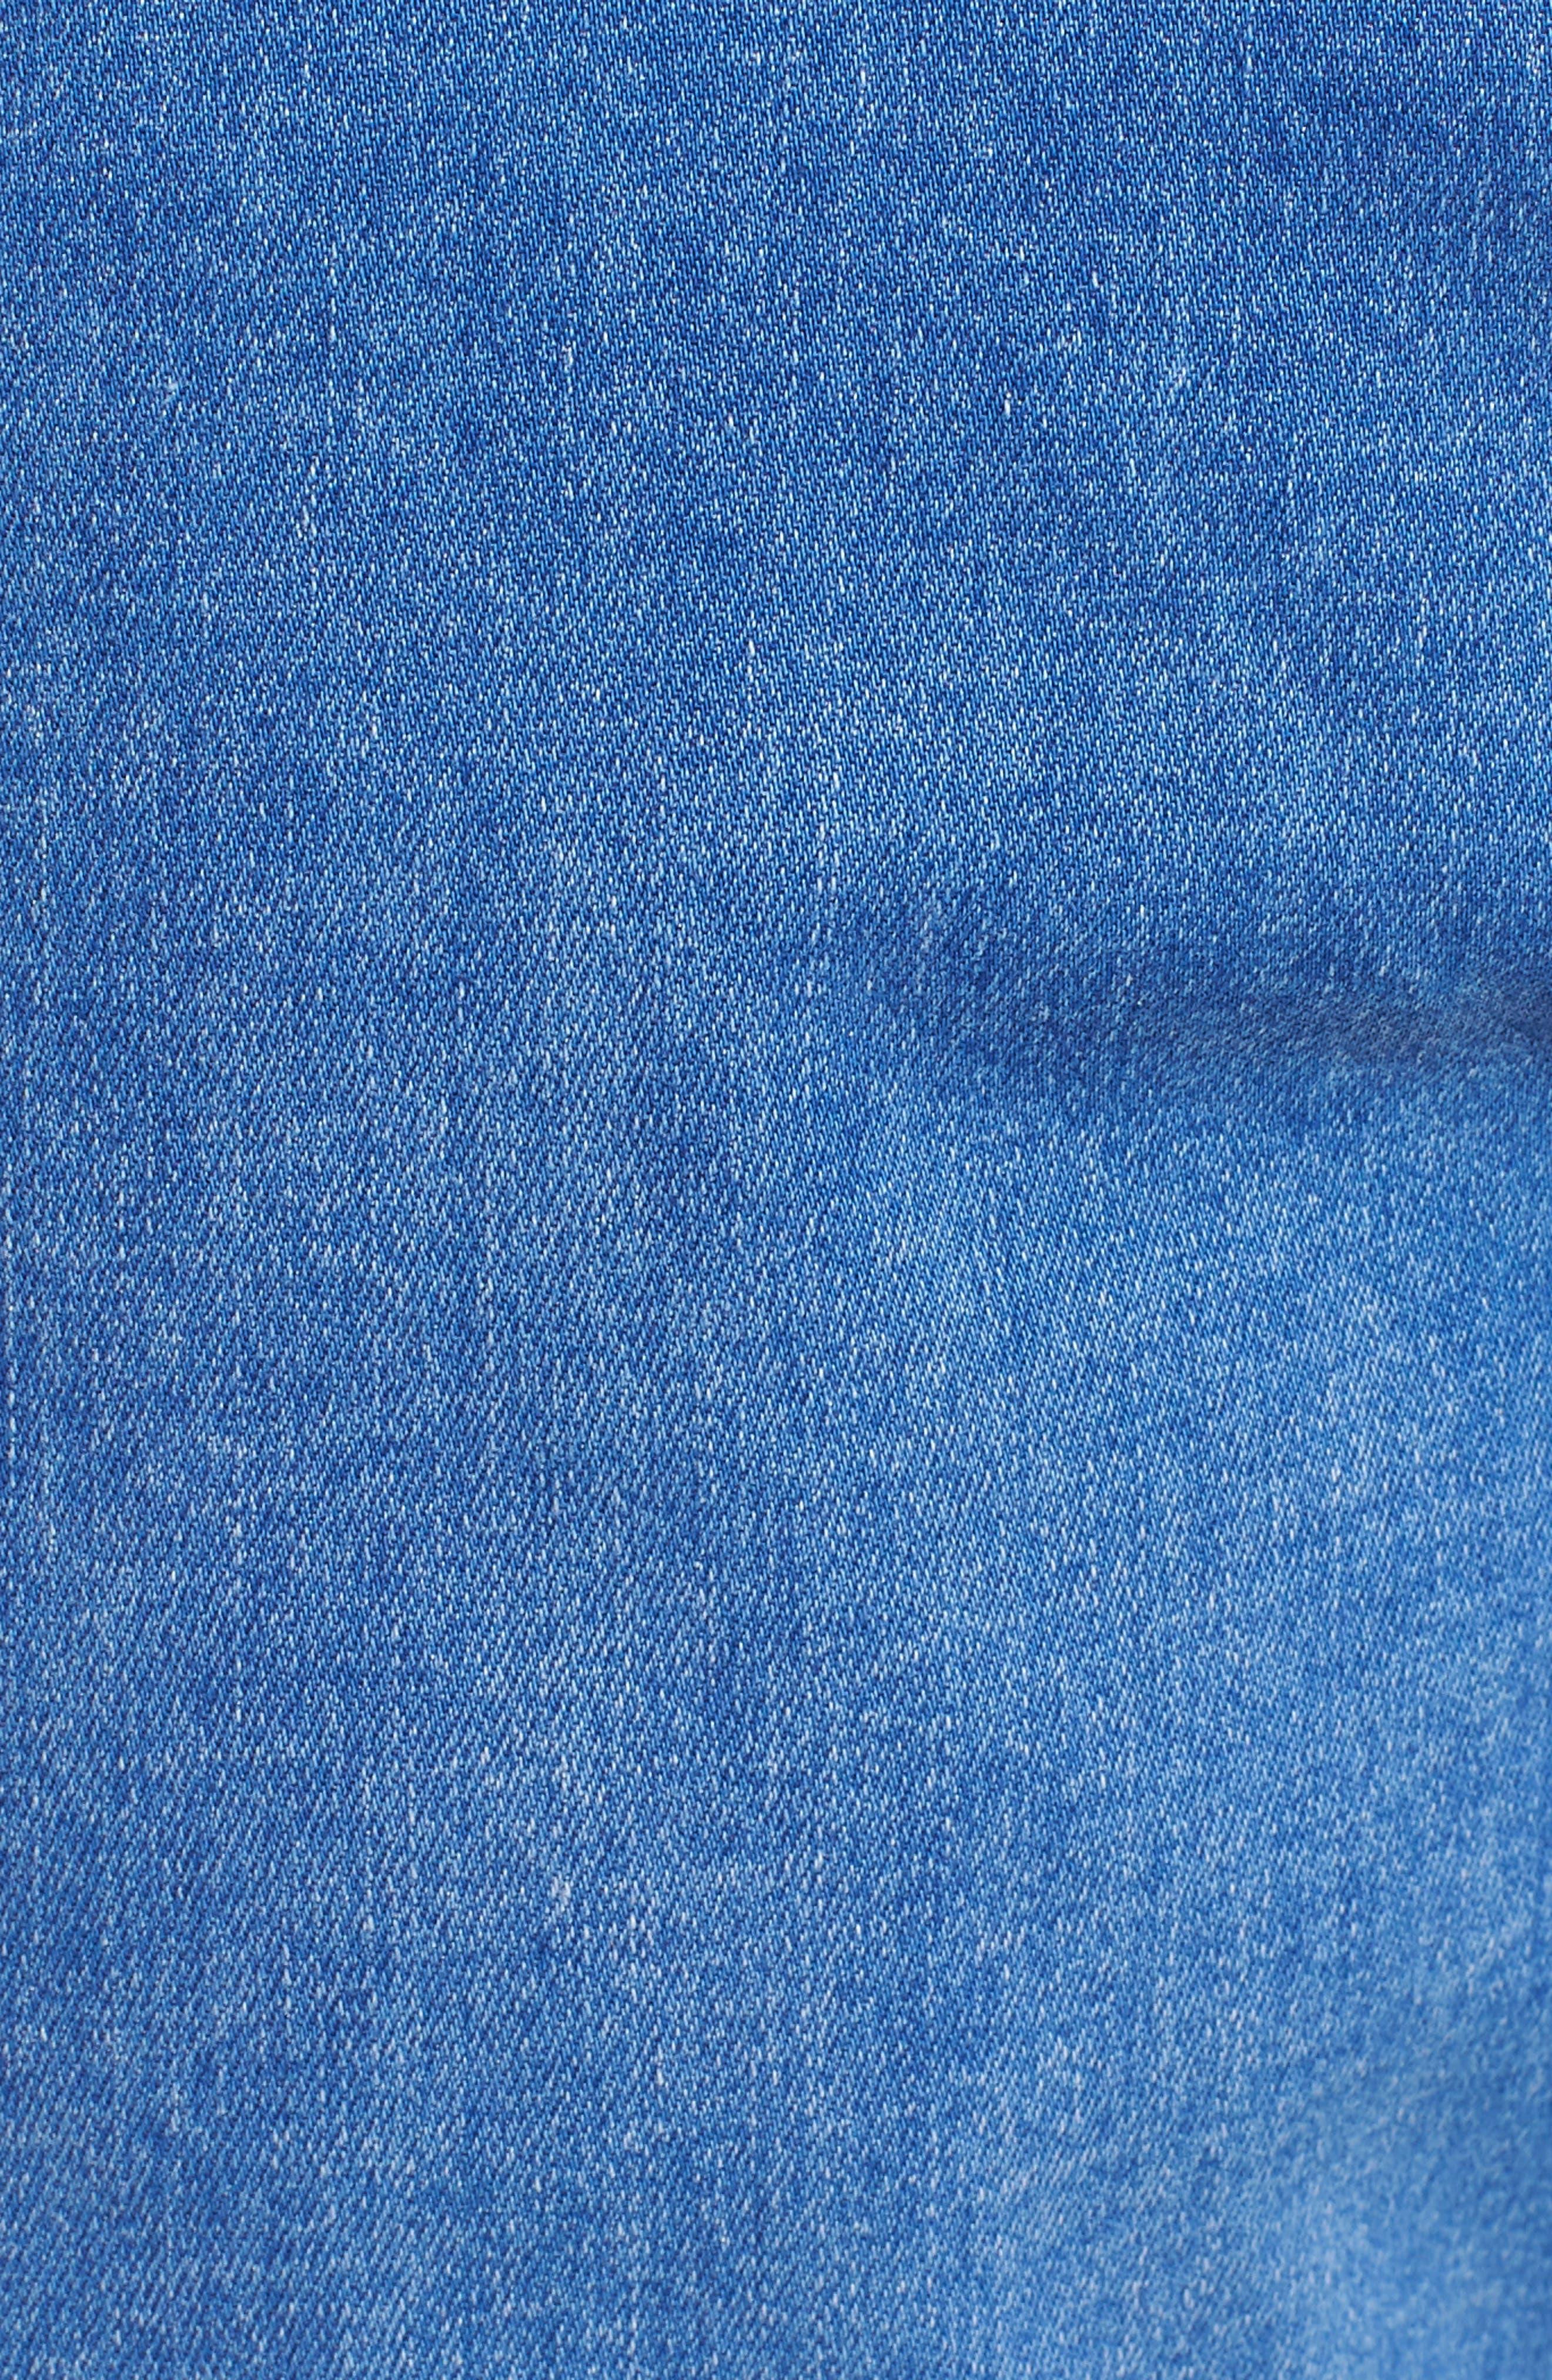 Rollies Slim Fit Jeans,                             Alternate thumbnail 5, color,                             BOLD BLUE